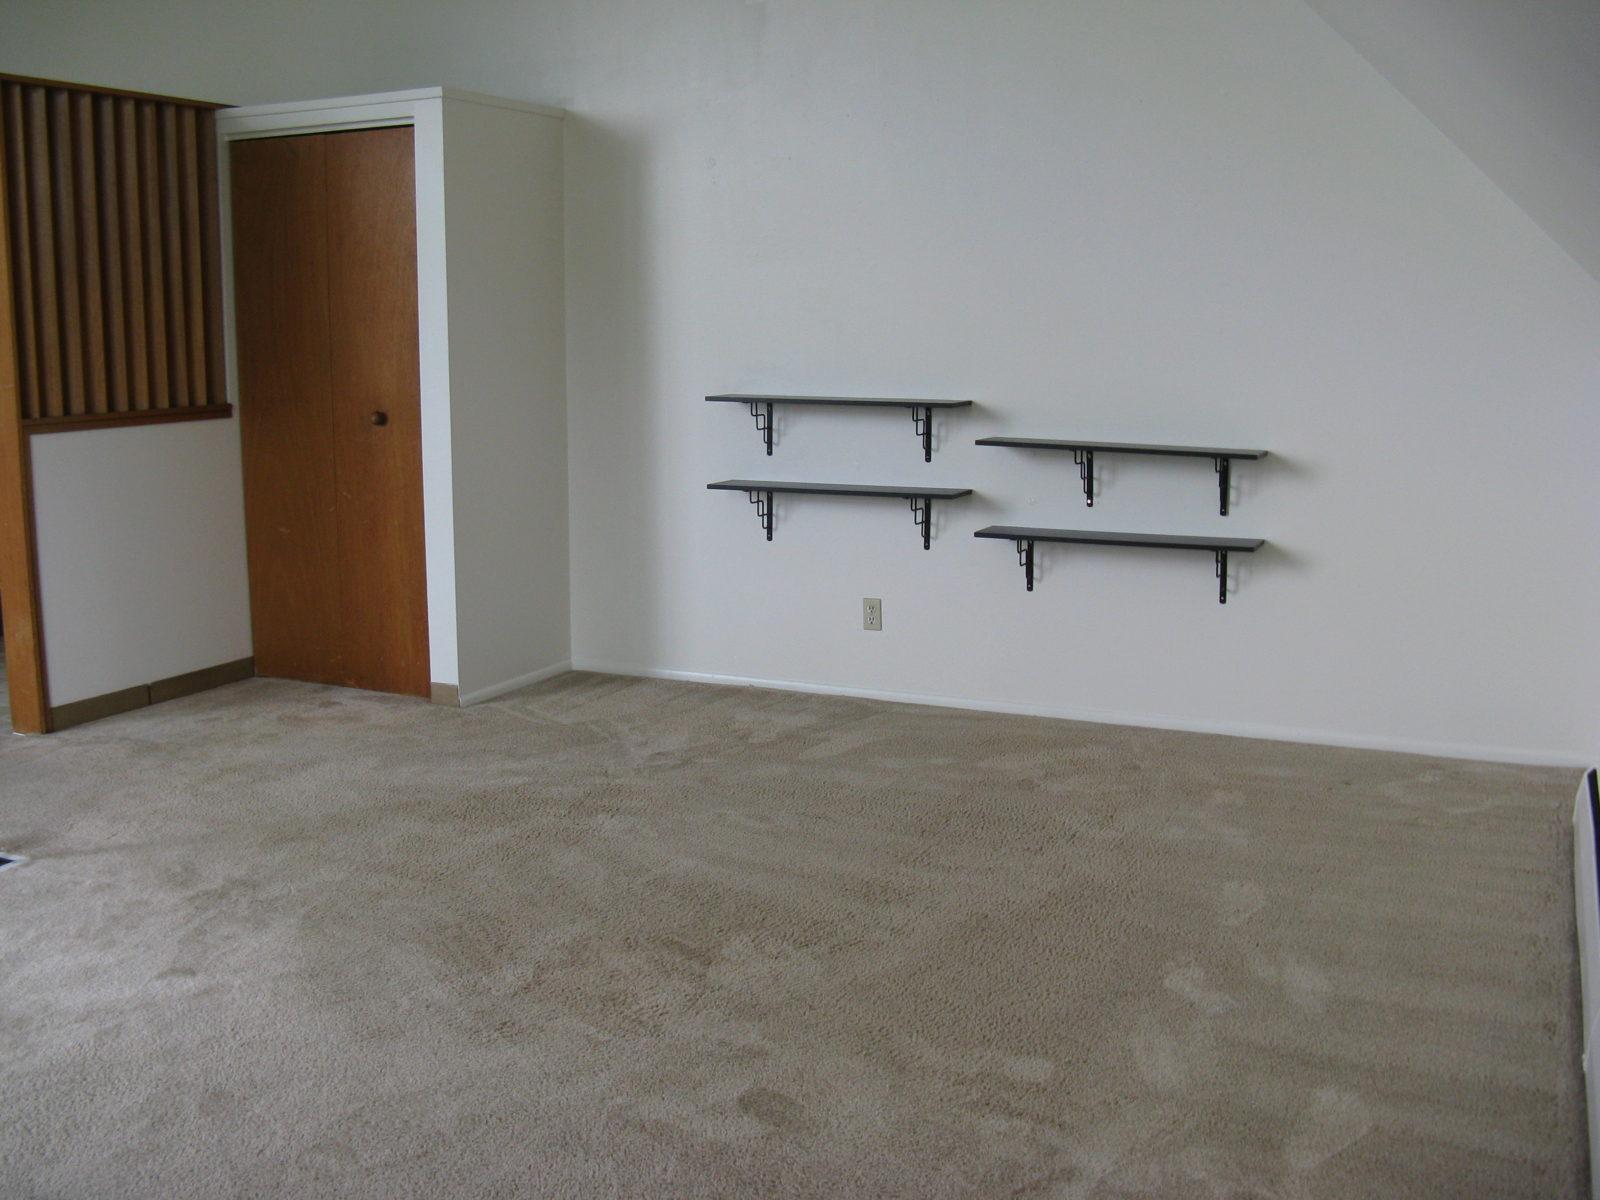 694 Living Room